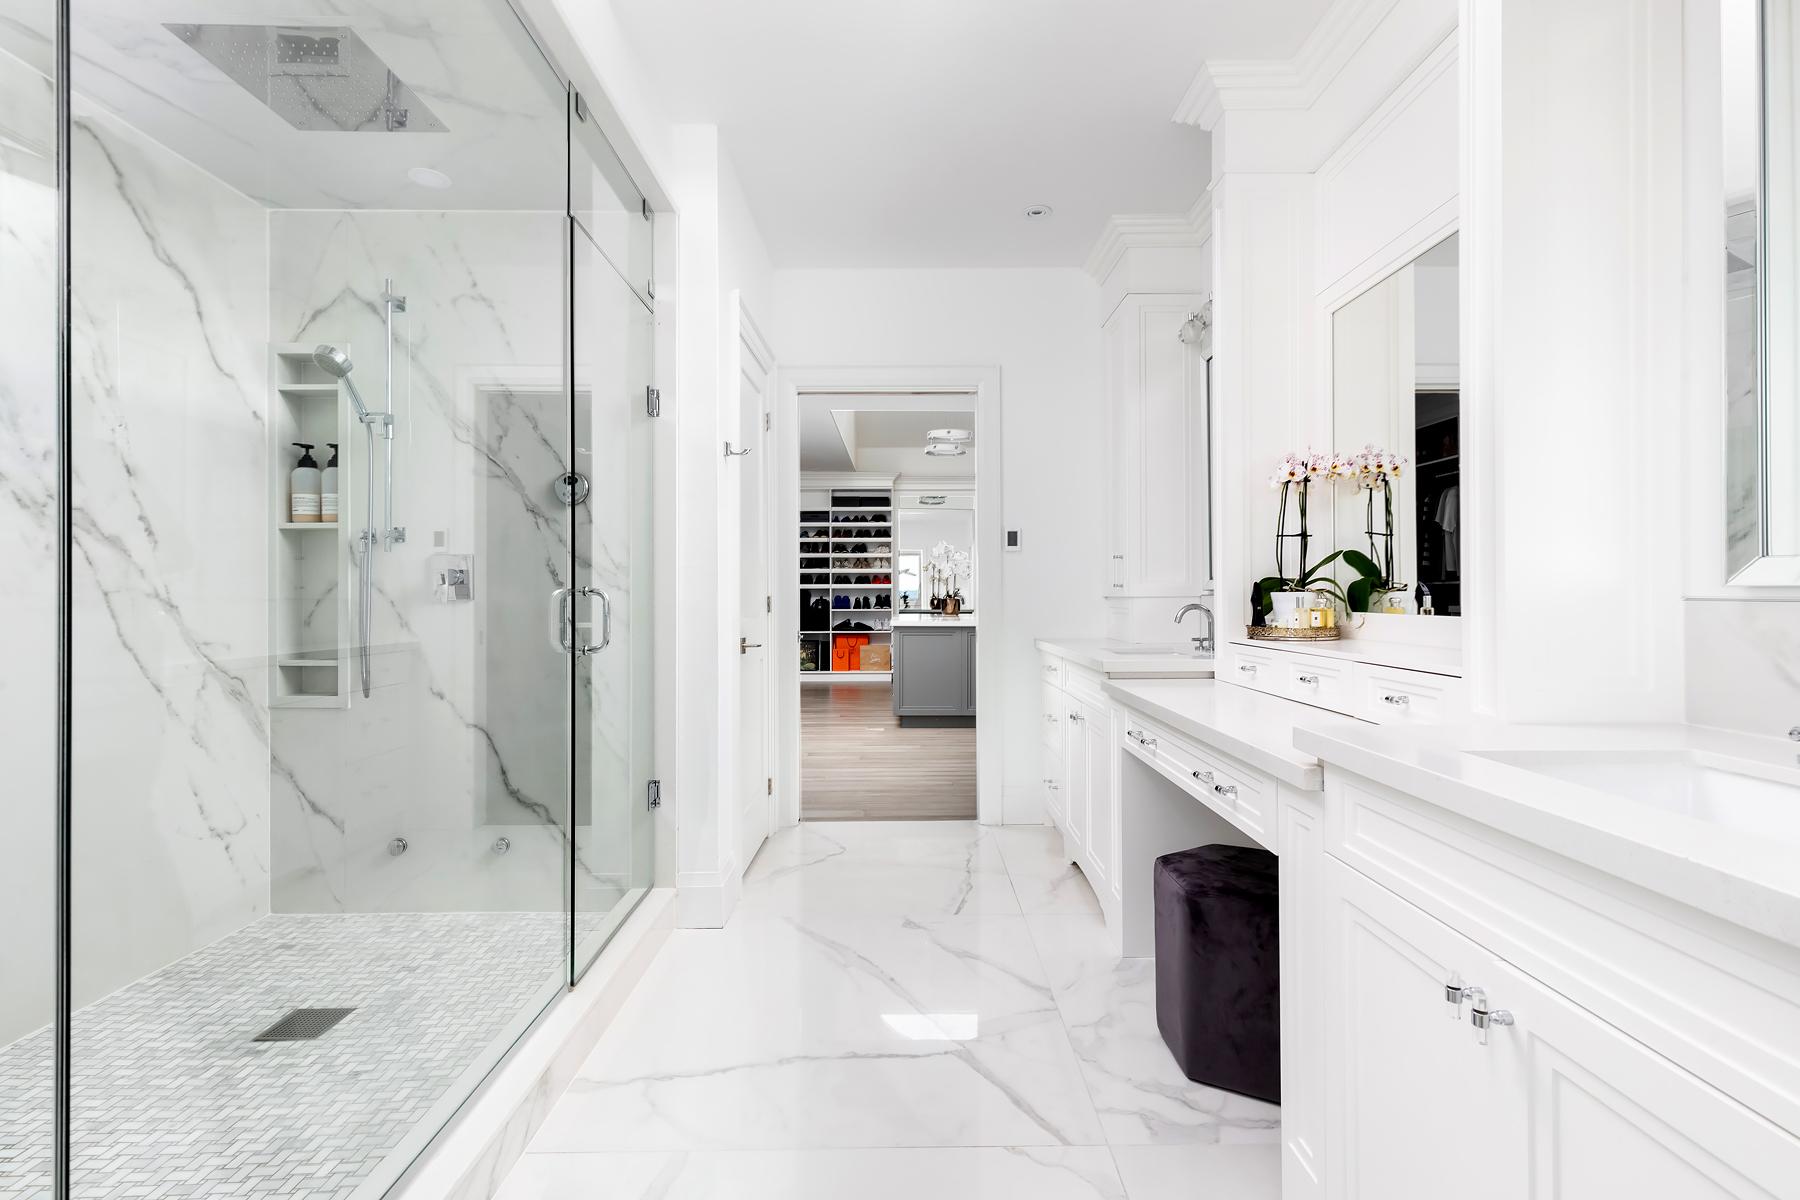 Shower - Motif Extra Calacatta Silver | Floor - Infinity Statuario | Shower Floor - Bianco Carrra Basketweave Mosaic